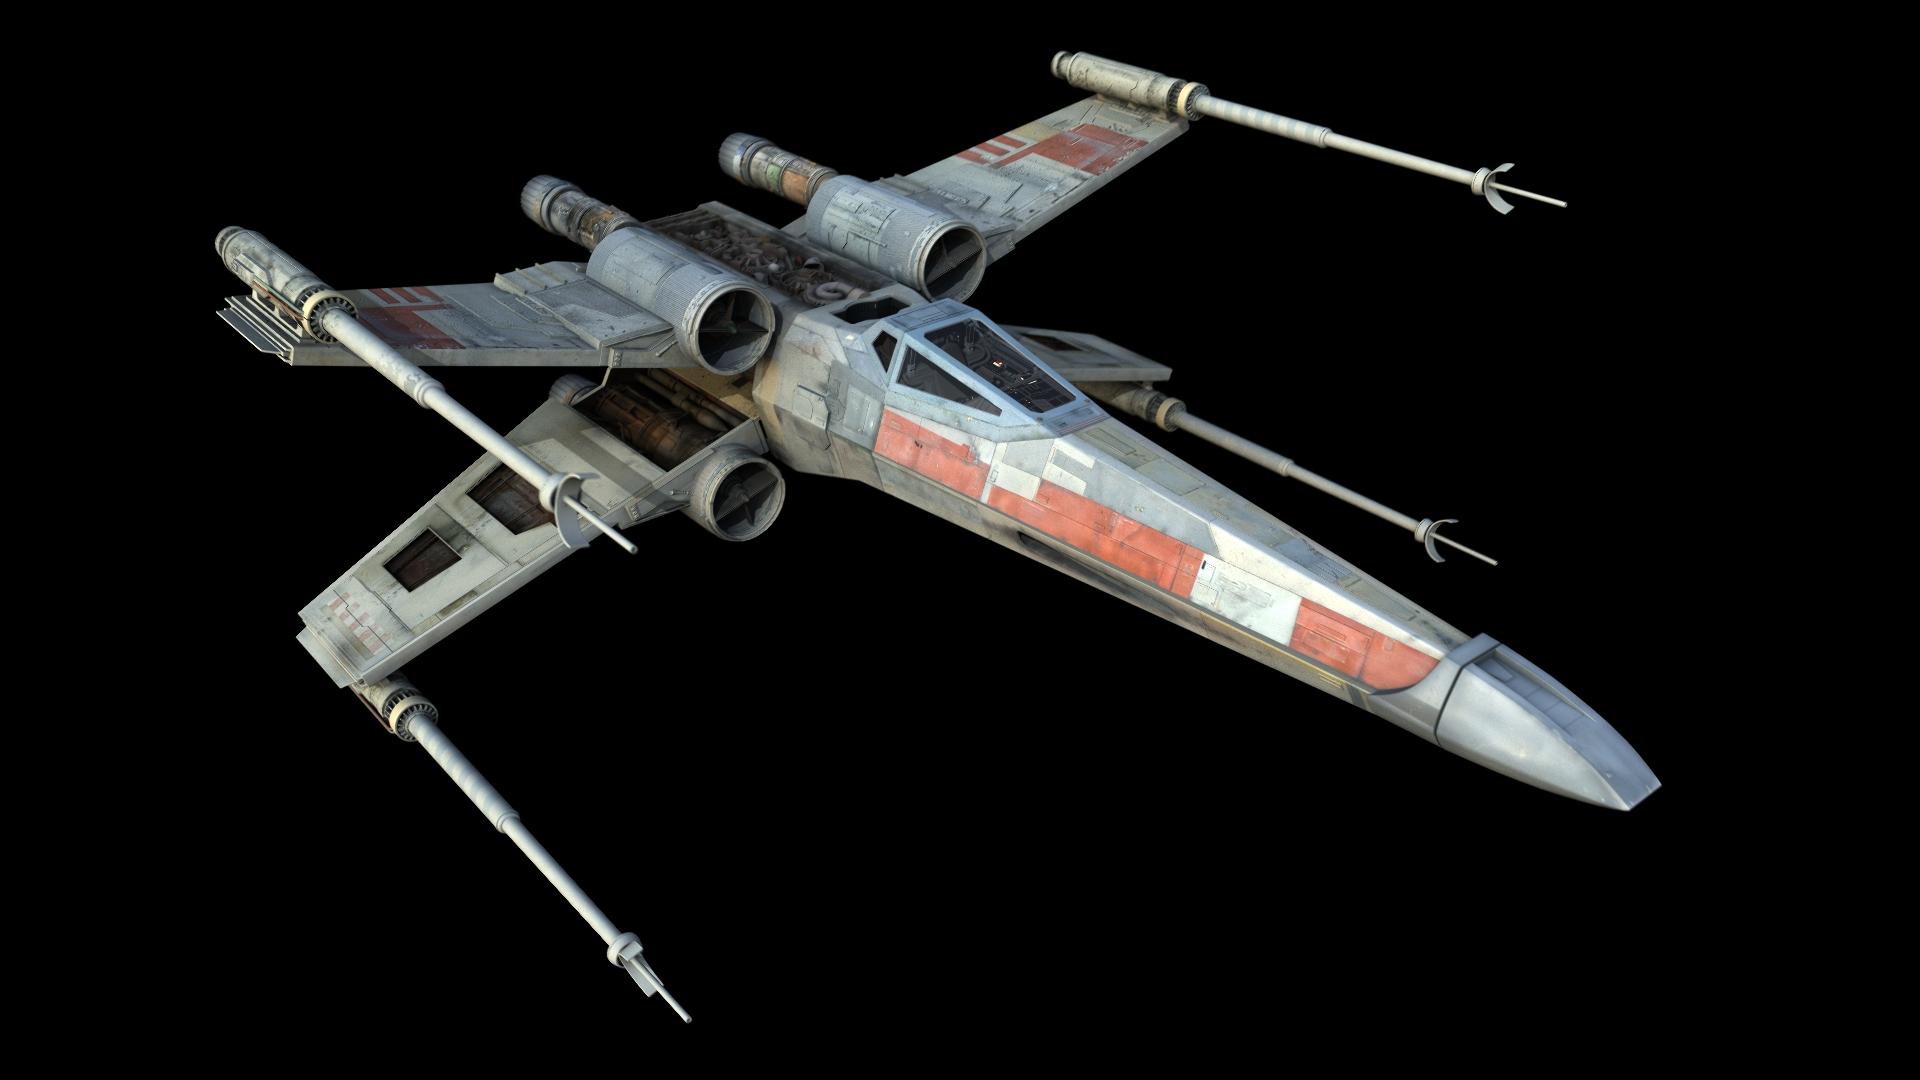 Модель star wars the force awakens poes x-wing fighter кит